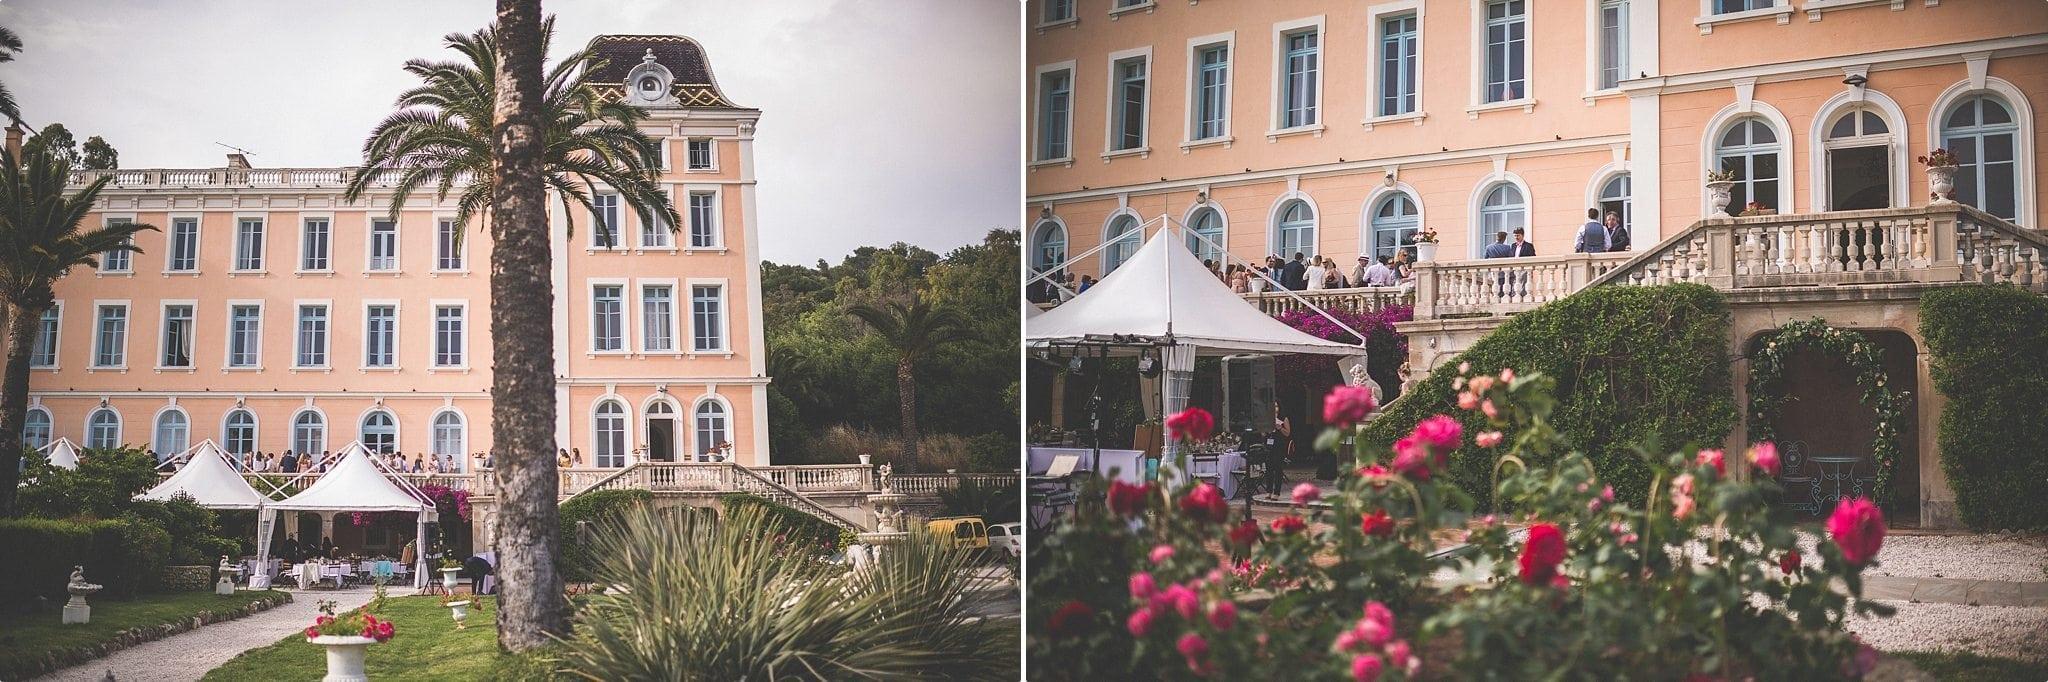 Domaine de la Croix Hotel L'Orangerie South of France vineyard and beach Wedding - Maria Assia Photography-360